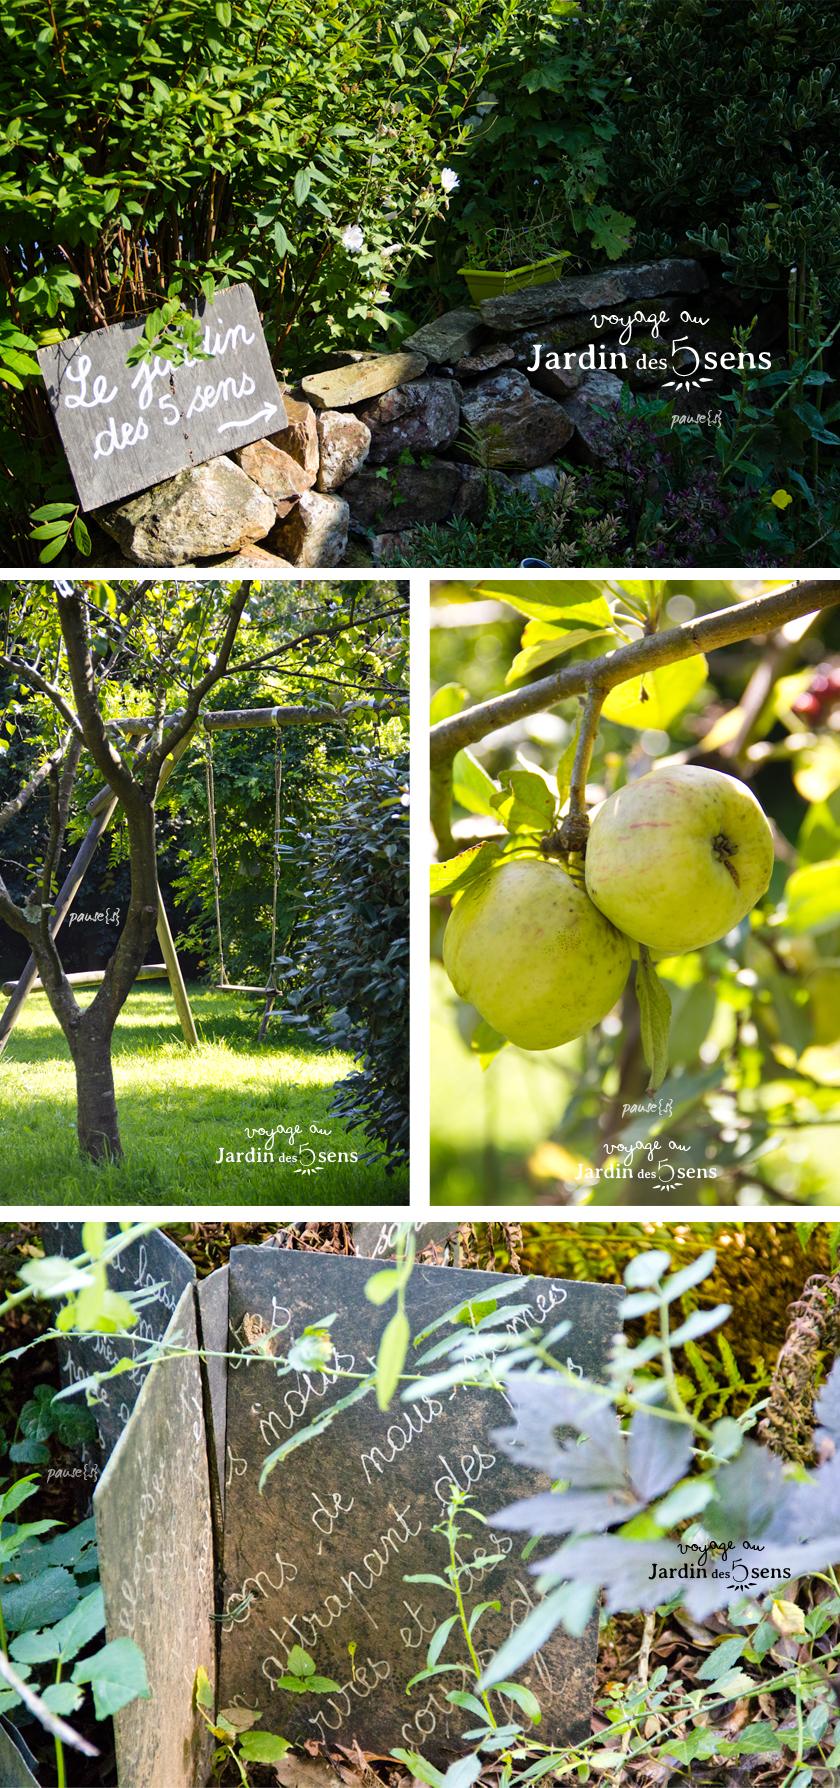 jardin5sens-1